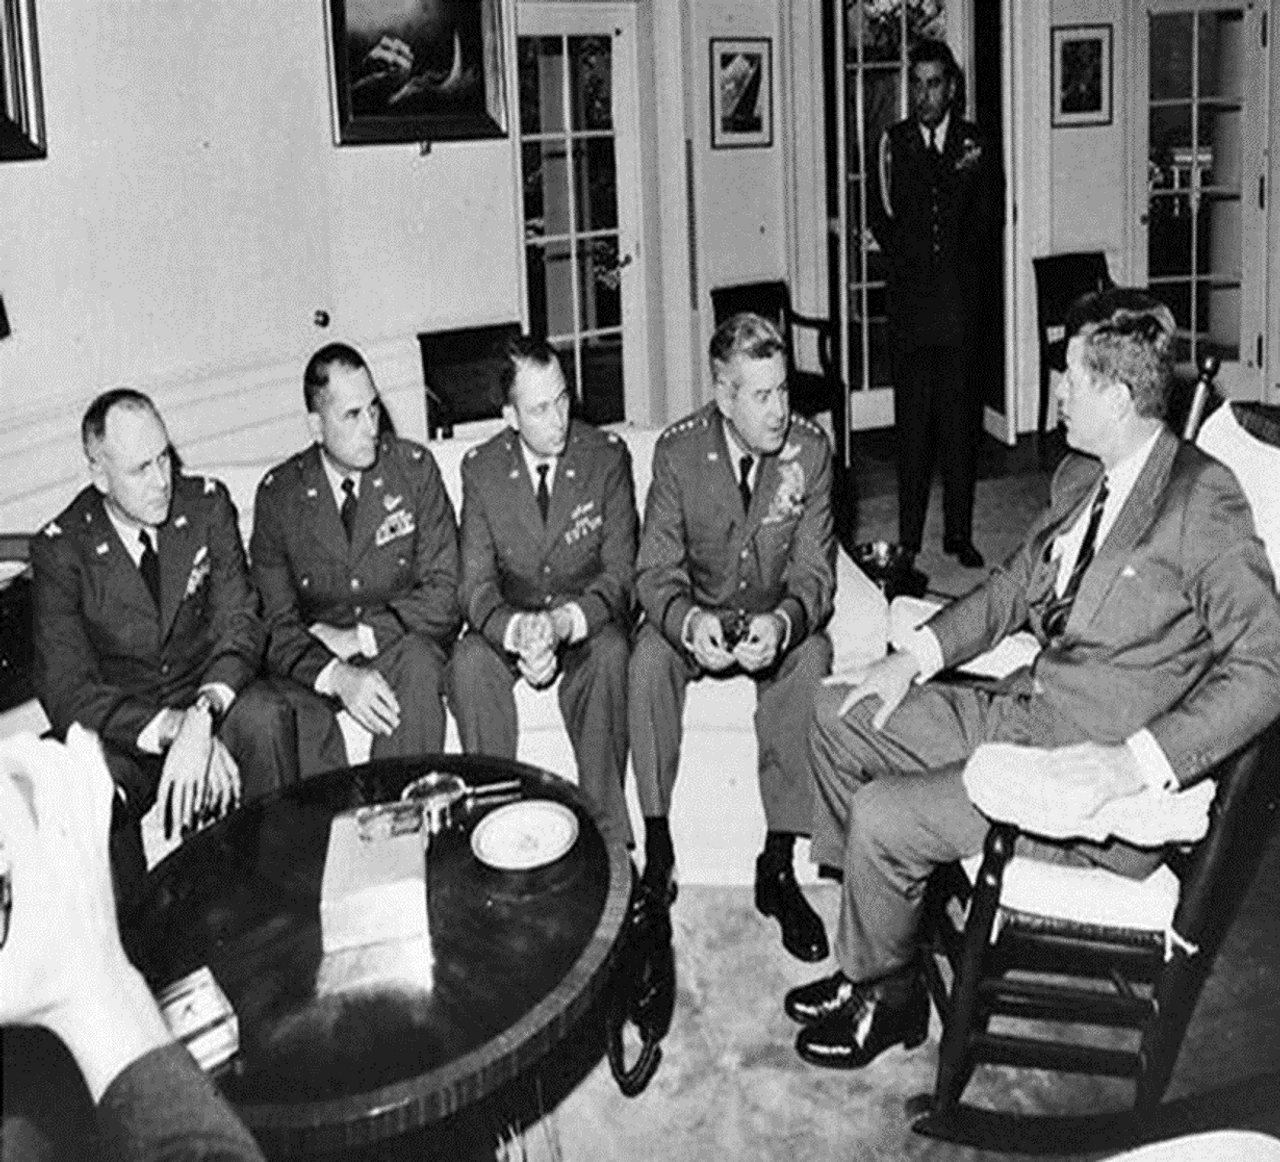 JFK Assassination - Conspirator 2 Worksheet & Answer Key